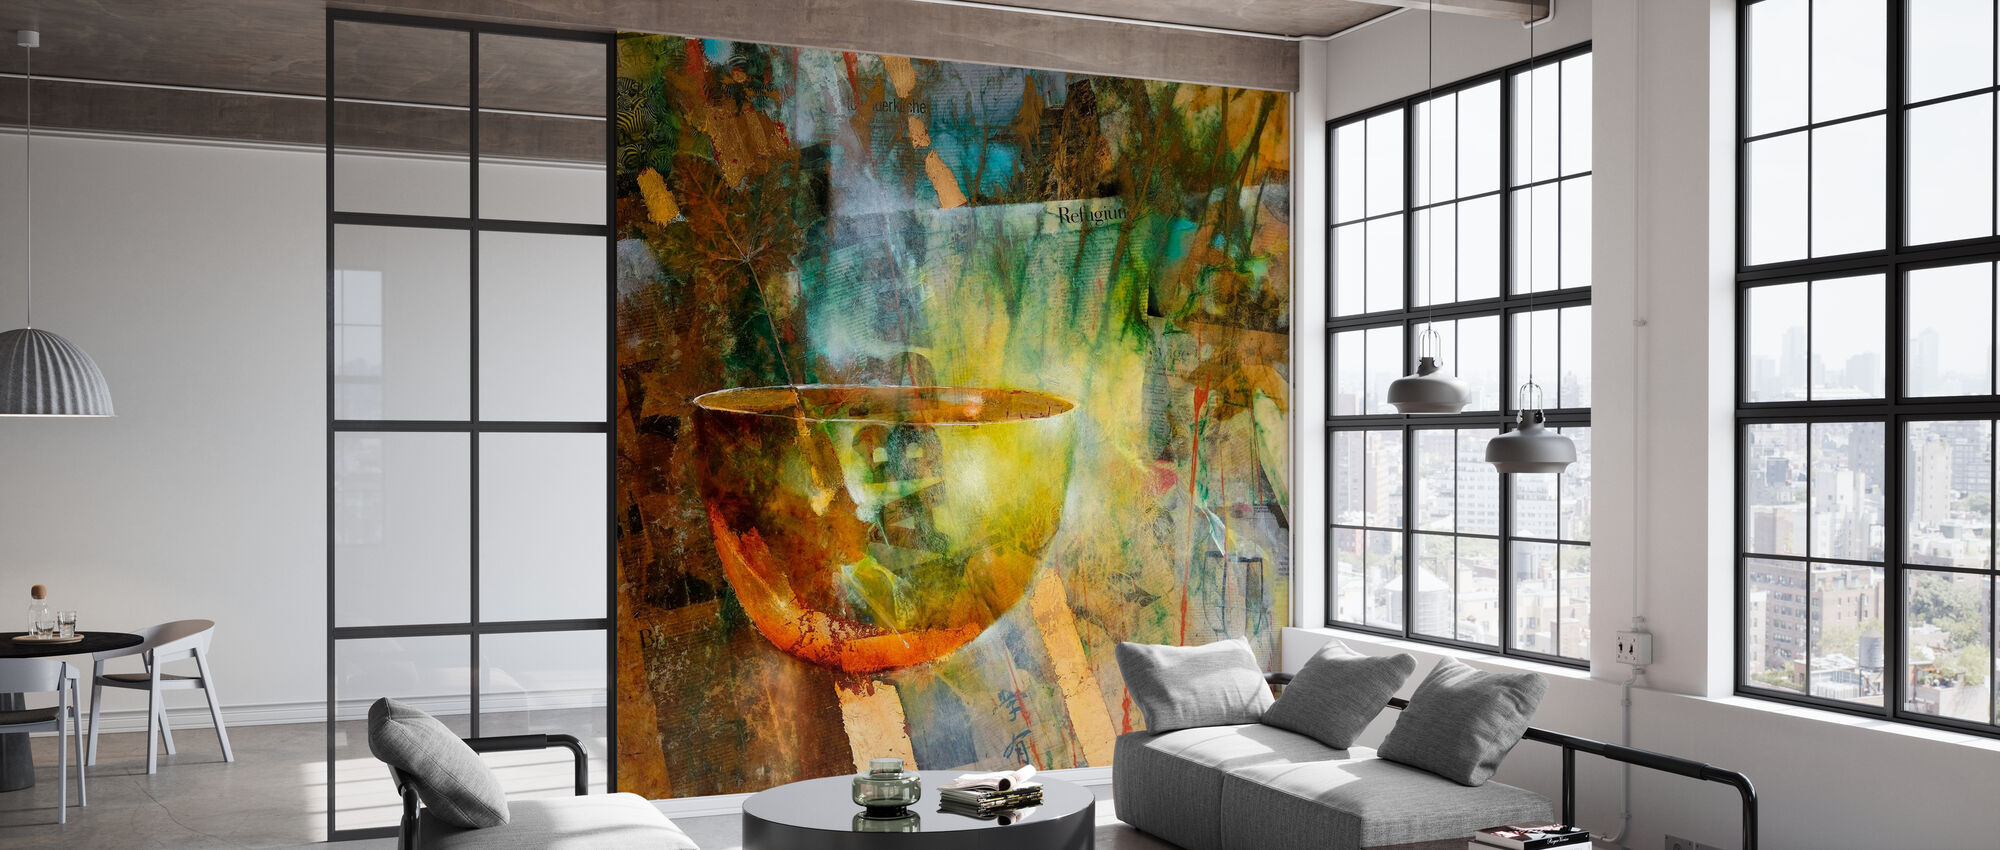 Refugium - Wallpaper - Office